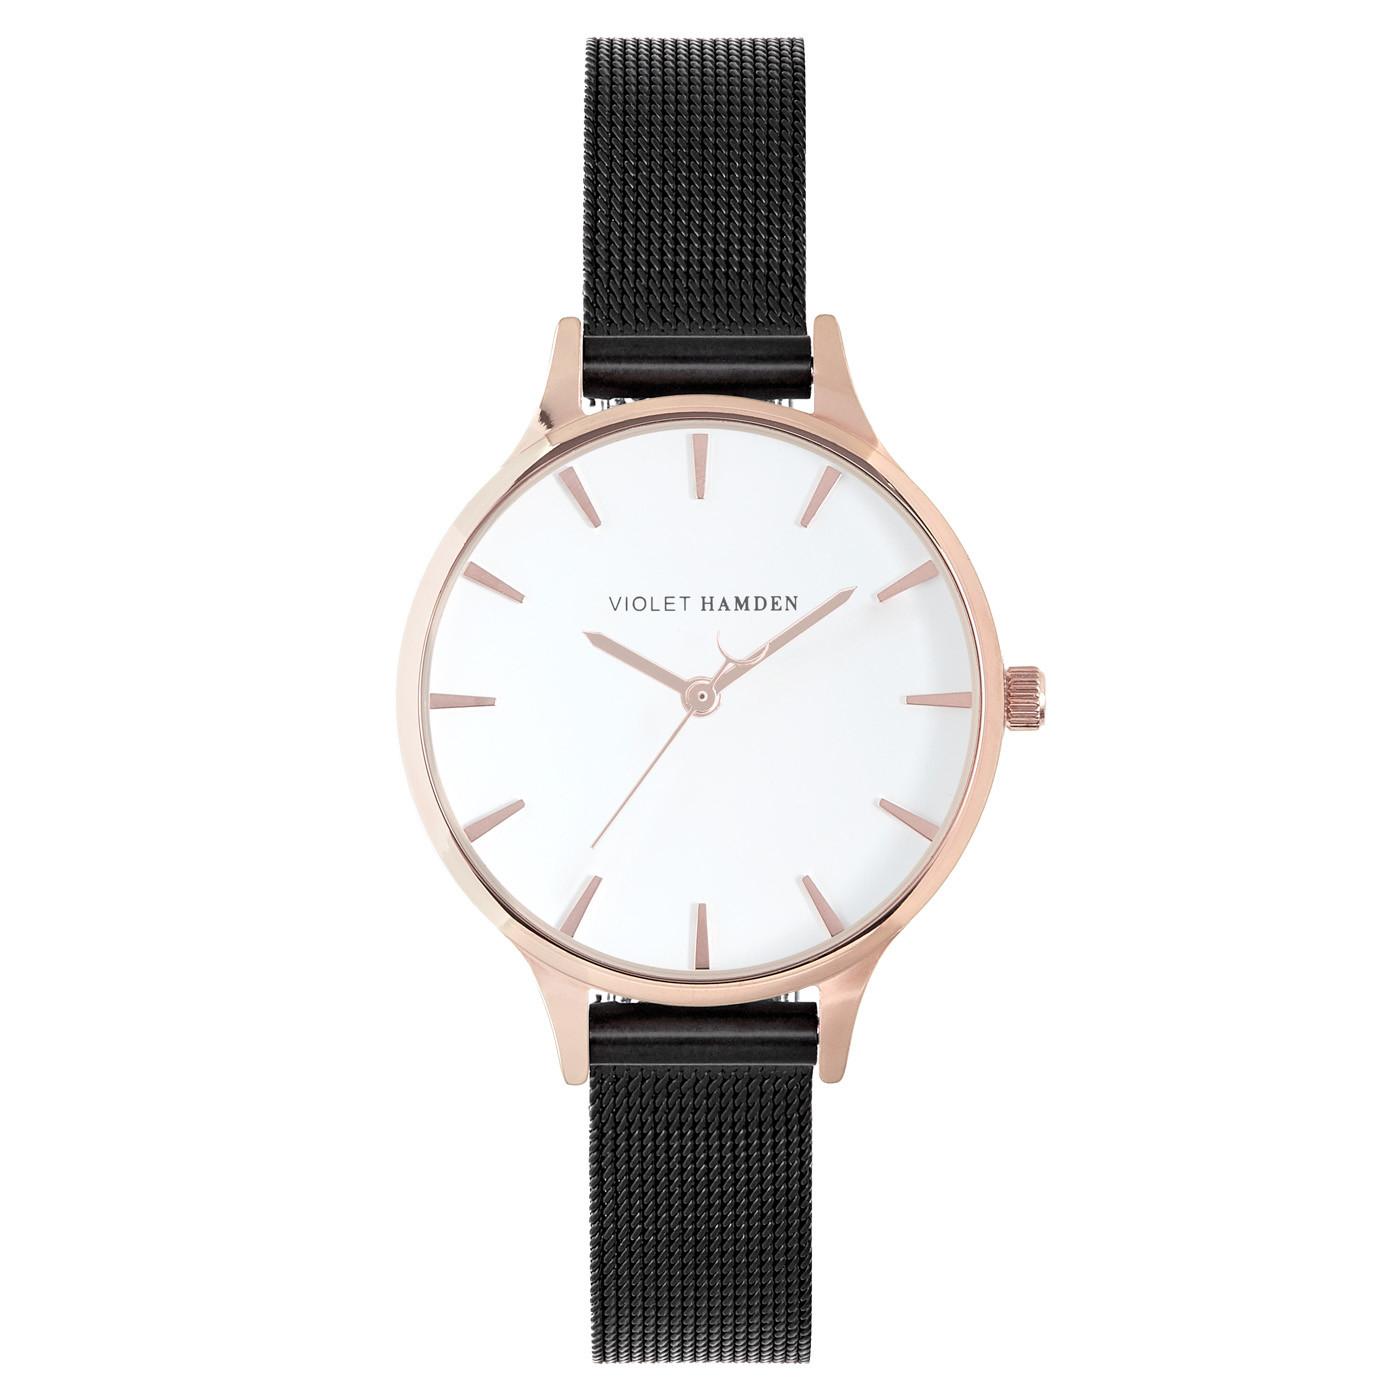 Violet Hamden Day & Night Rose Iron Black horloge VH01025 (32 mm)